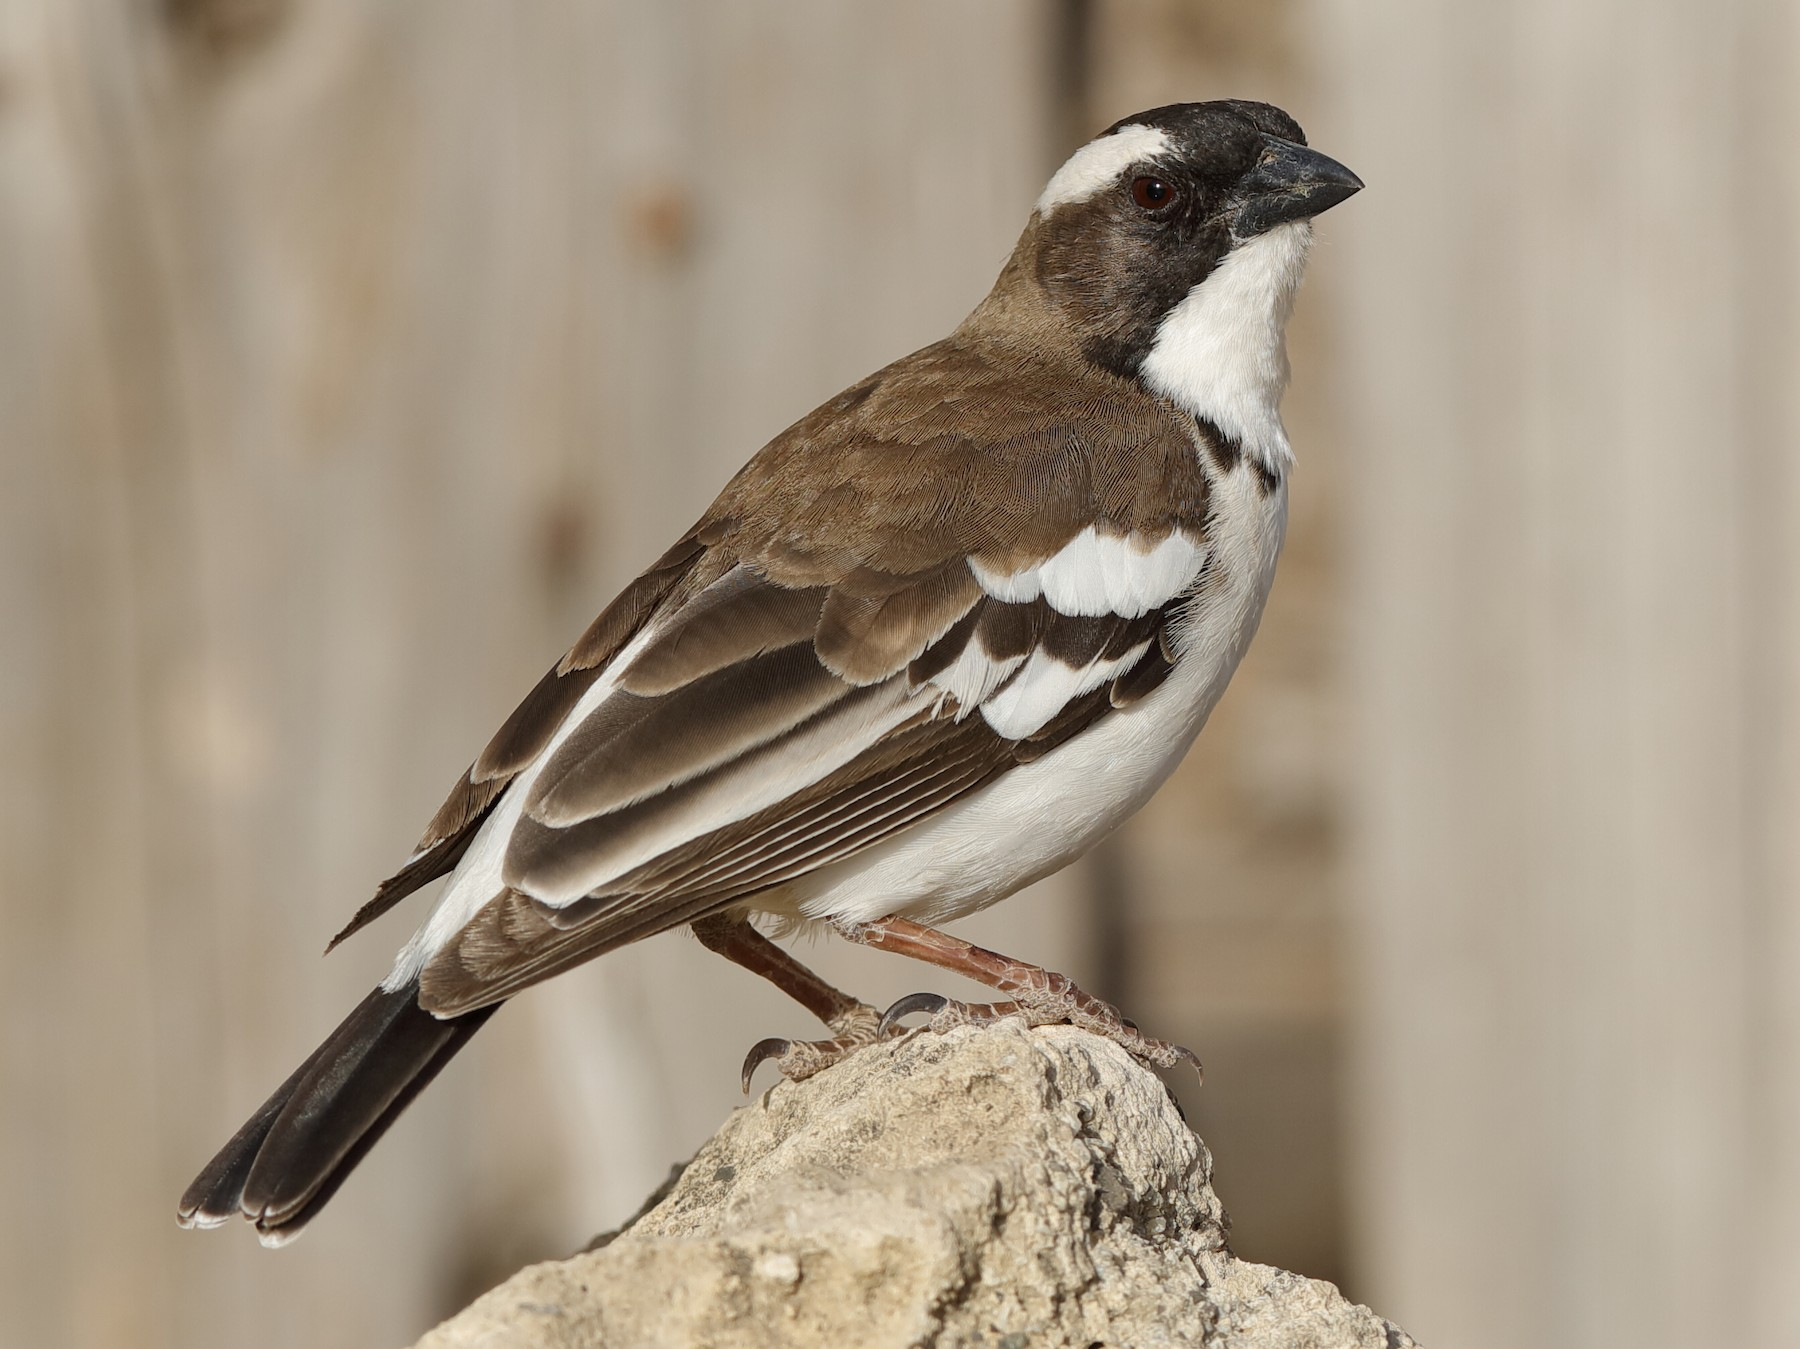 White-browed Sparrow-Weaver - Holger Teichmann